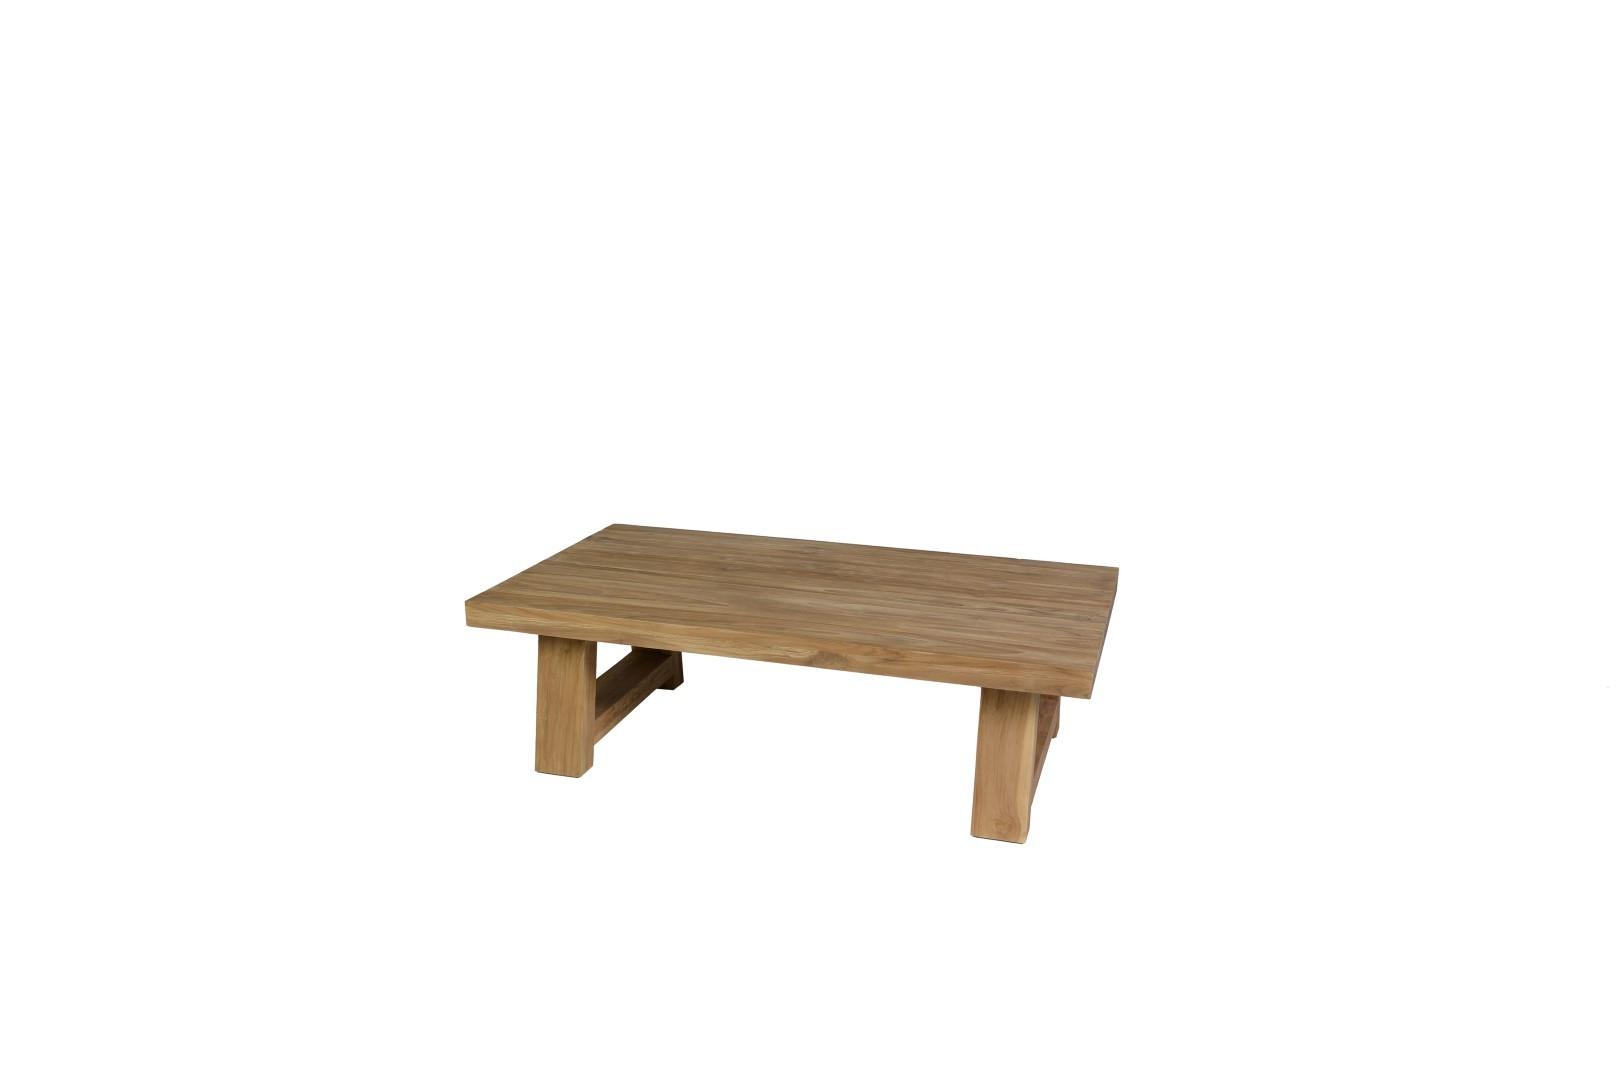 Thomas coffee table 140x80x43 cm teak